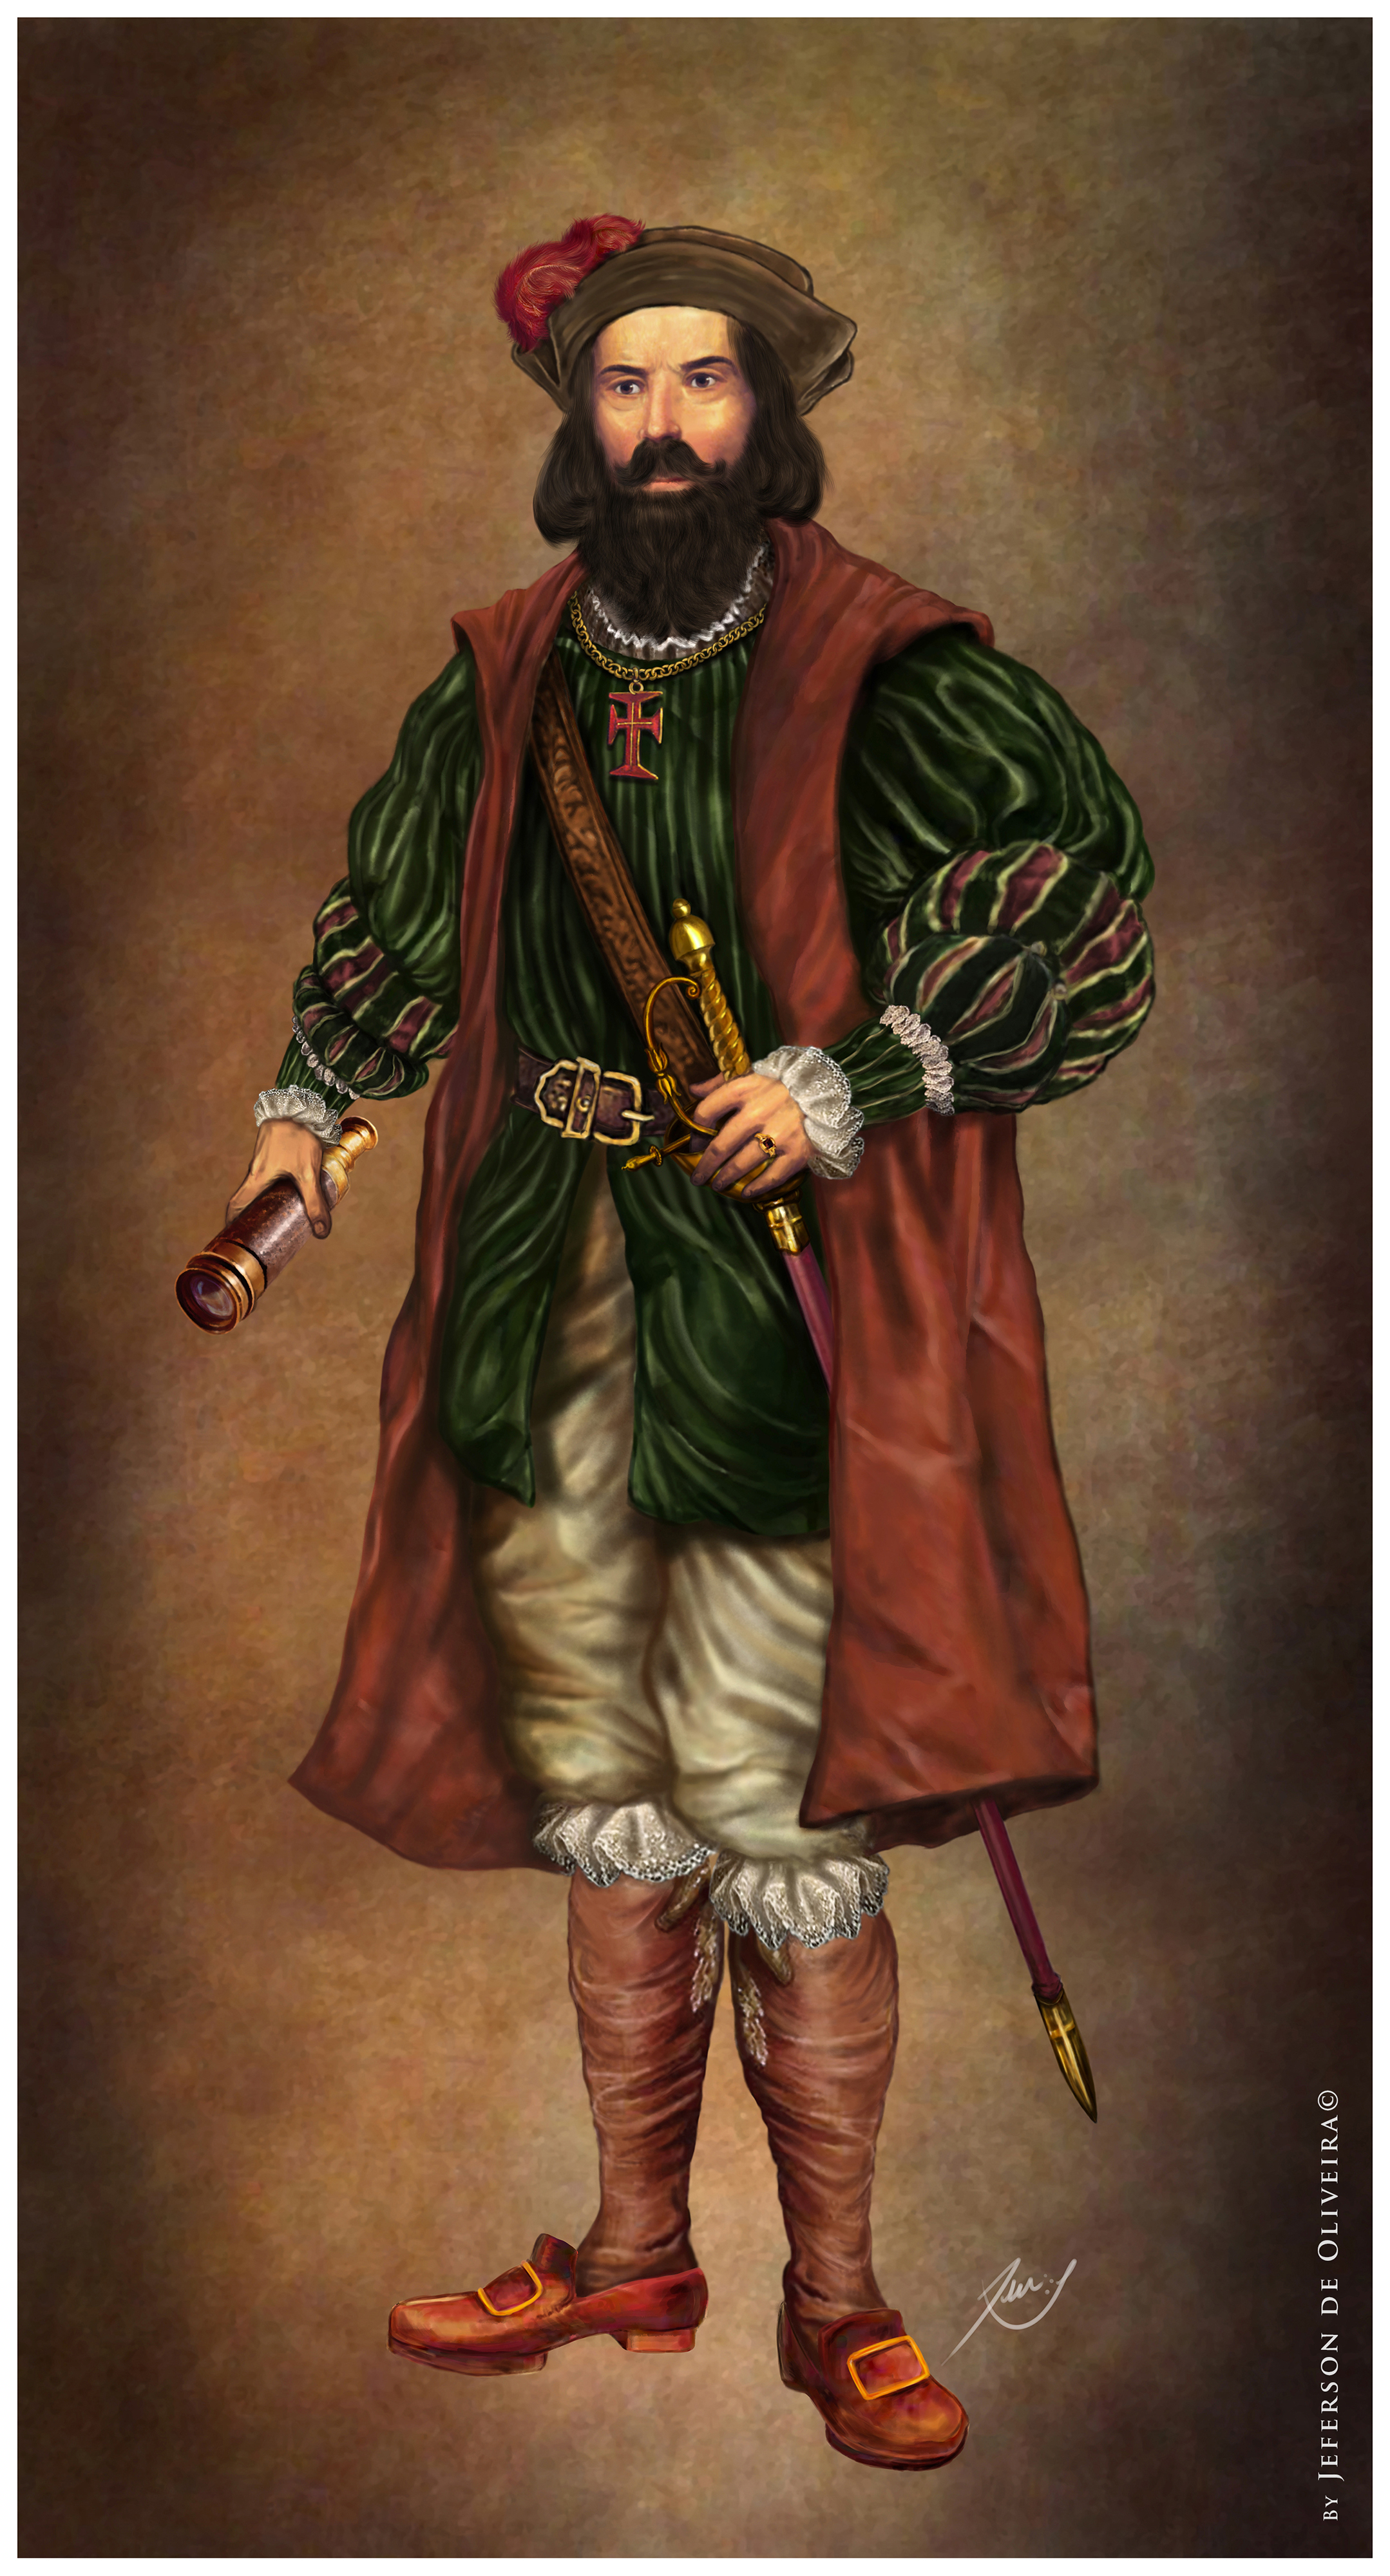 Anais Salazar H Extremo vasco fernandes coutinho - wikipedia, la enciclopedia libre